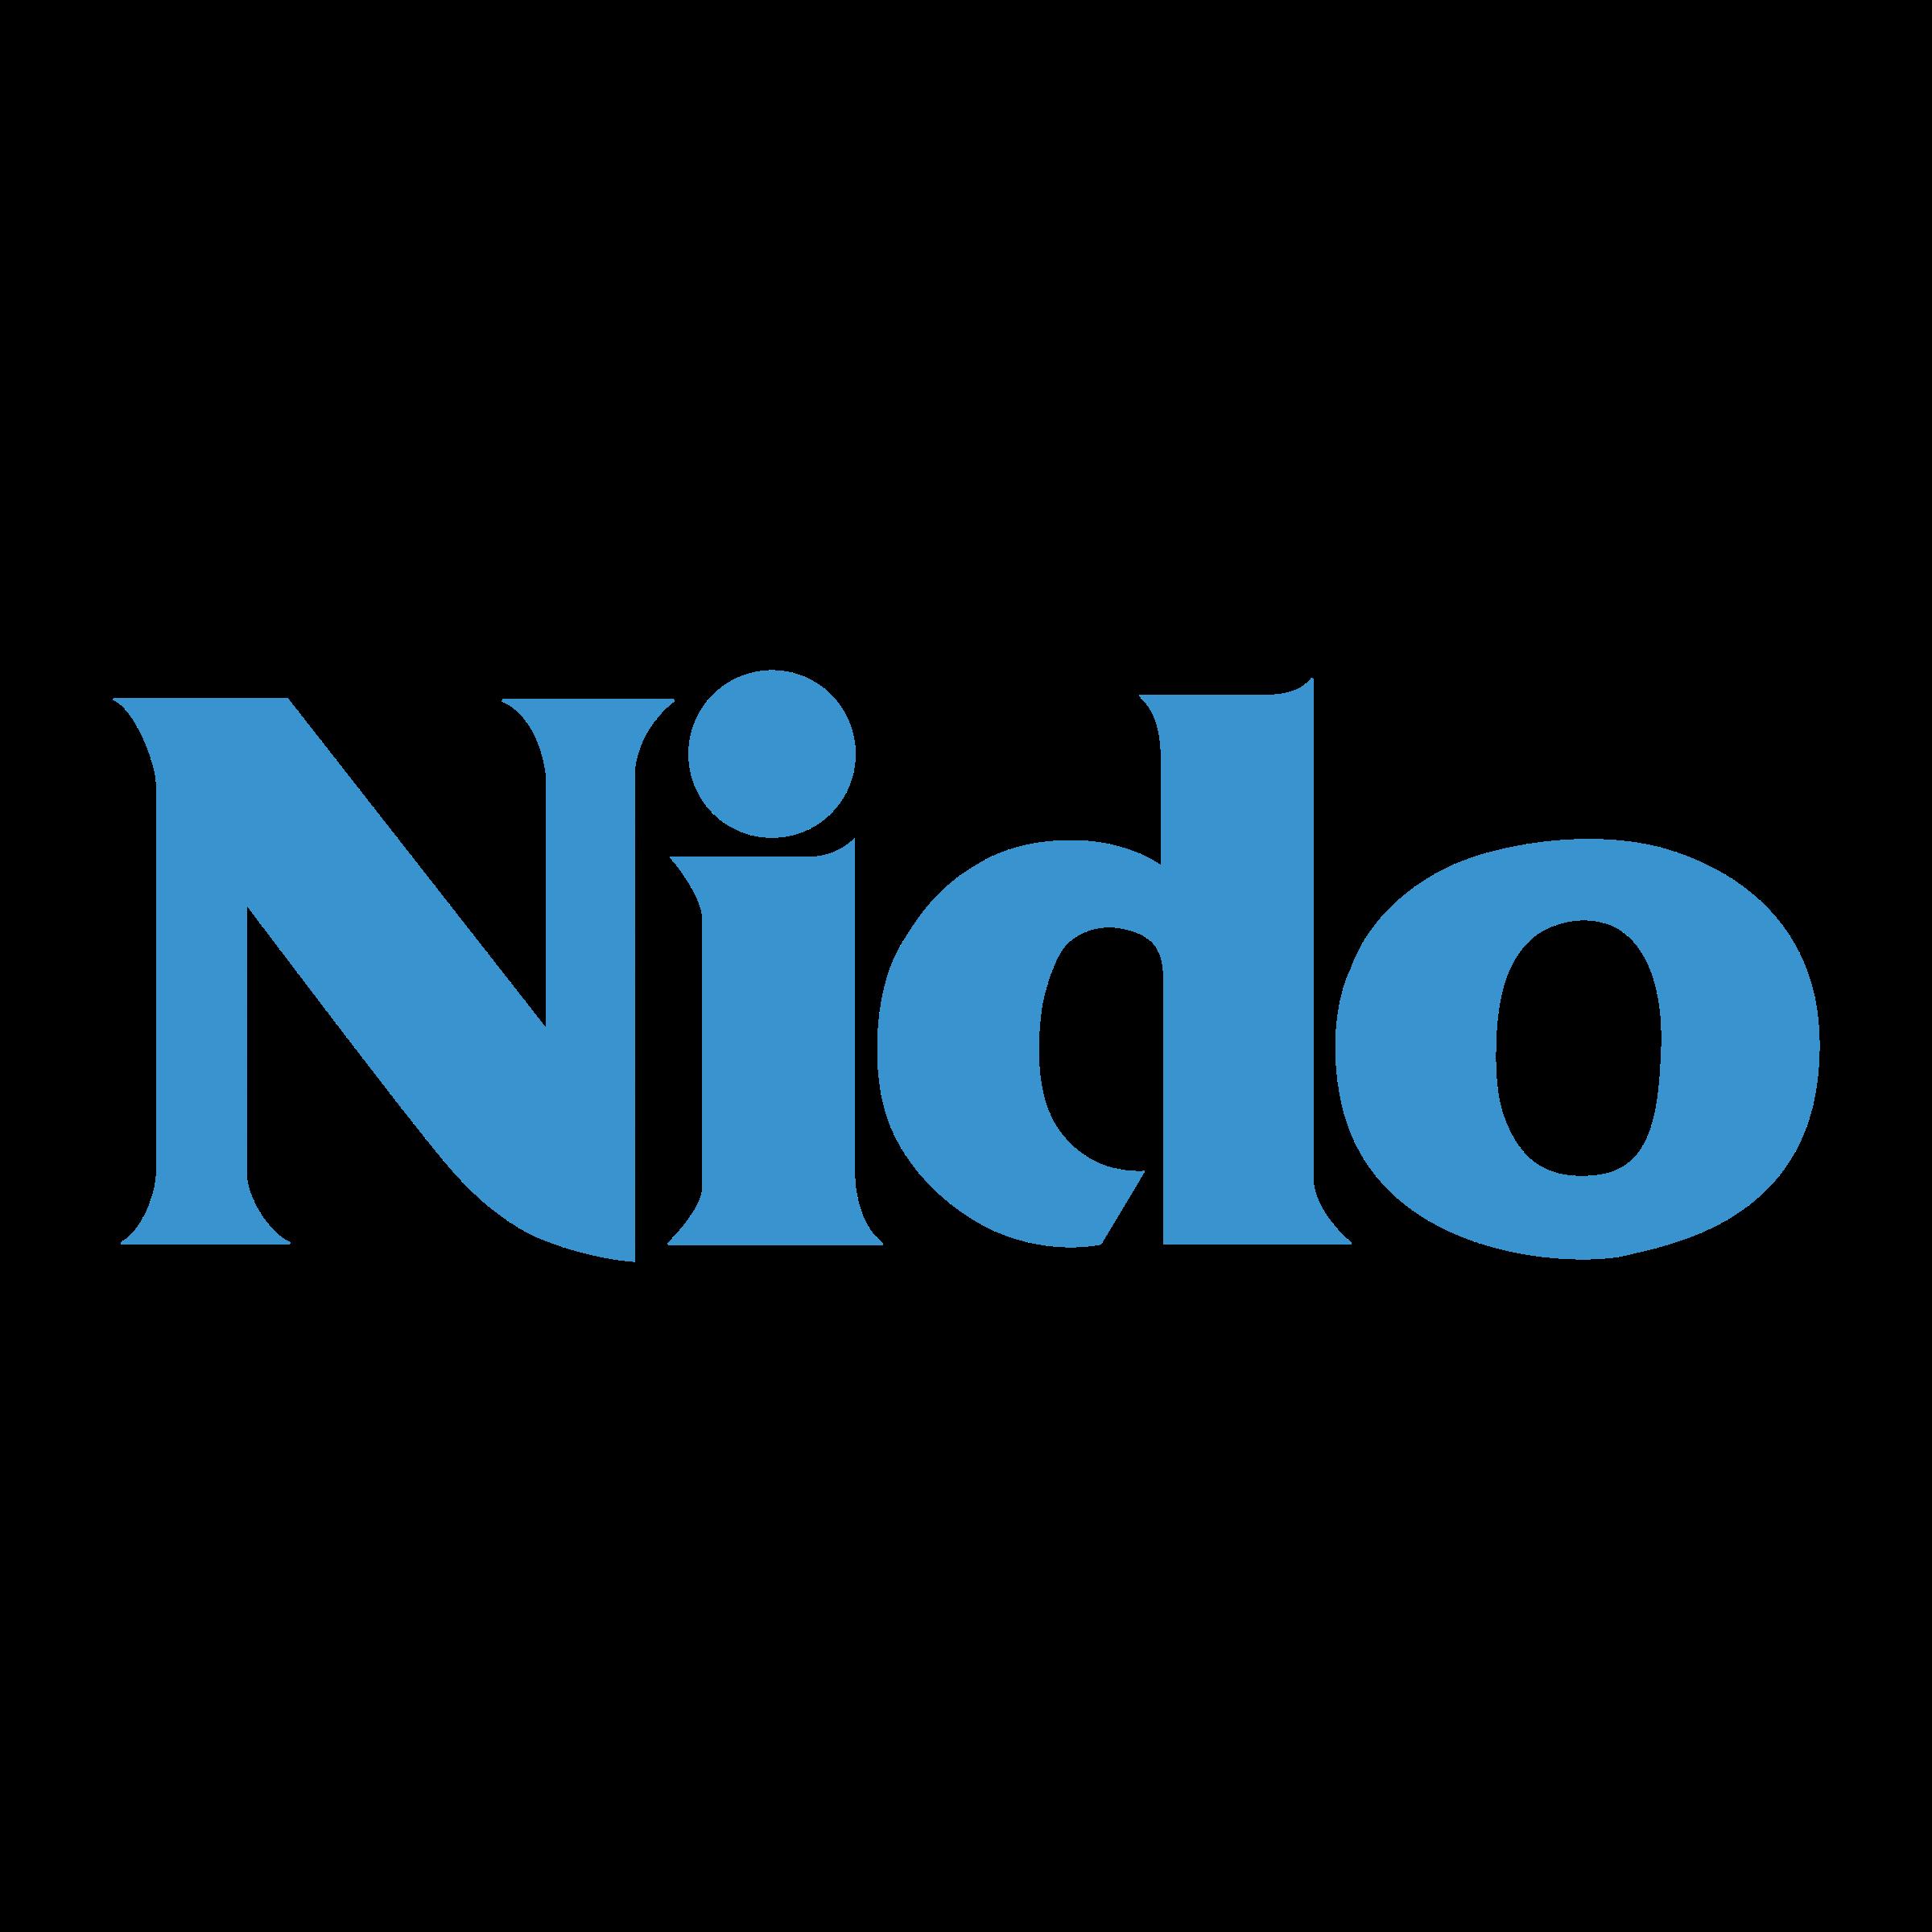 nido logo png transparent amp svg vector freebie supply